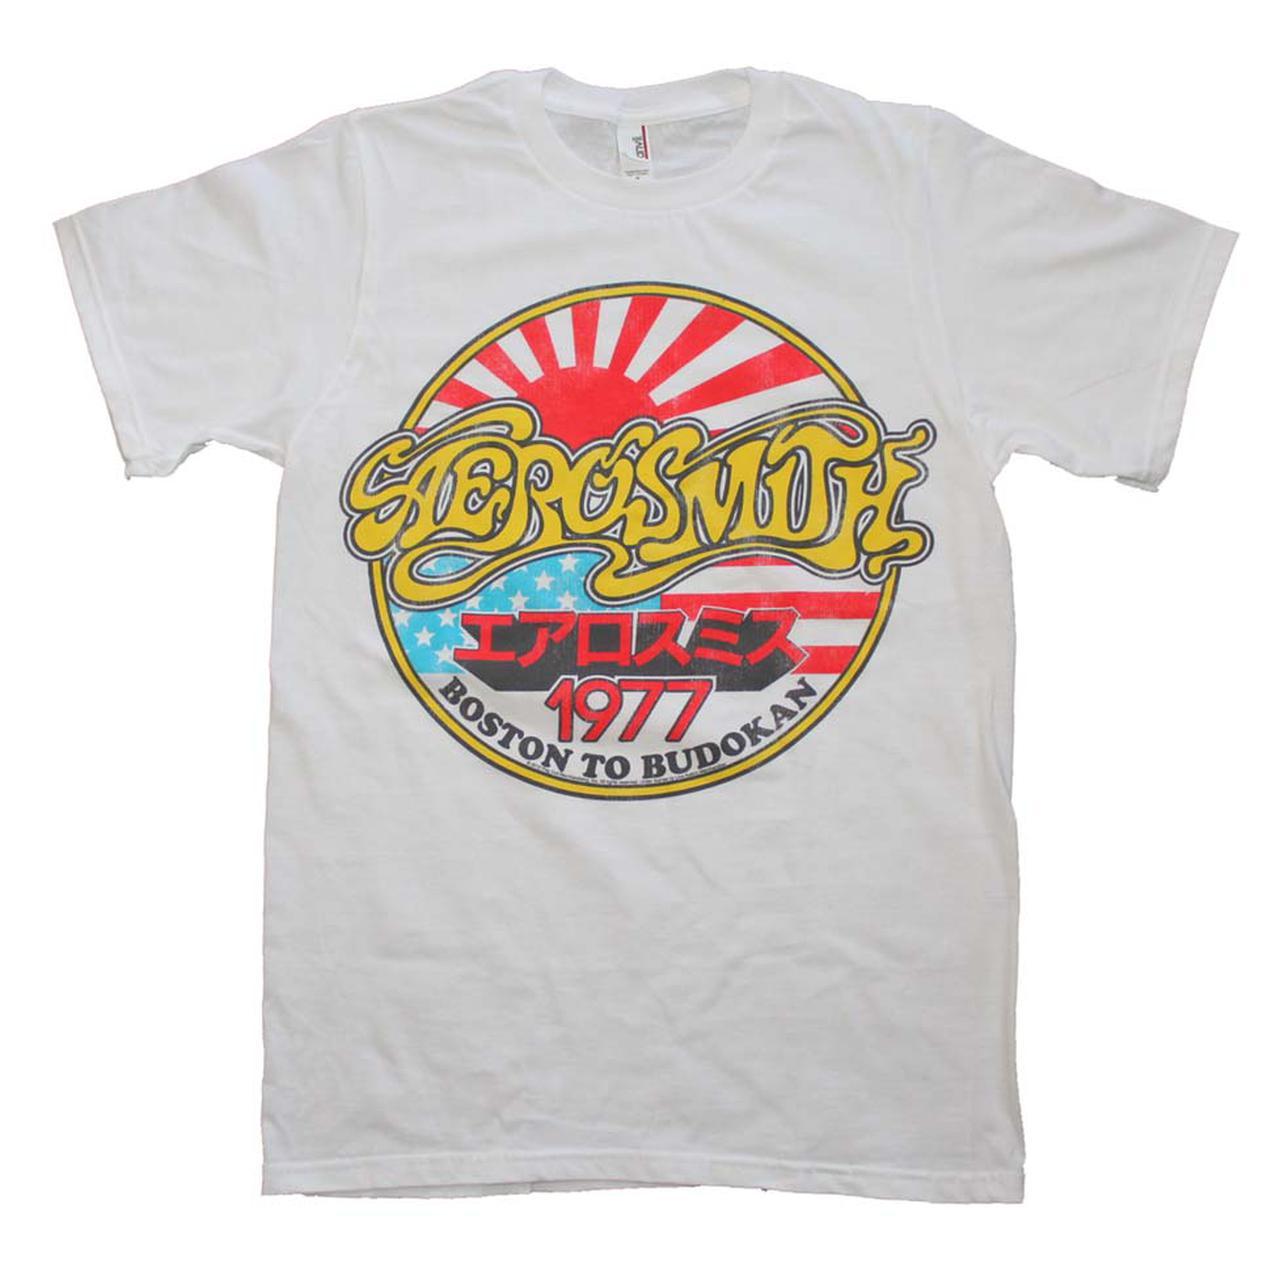 Aerosmith T Shirt Aerosmith Boston To Budokan Vintage